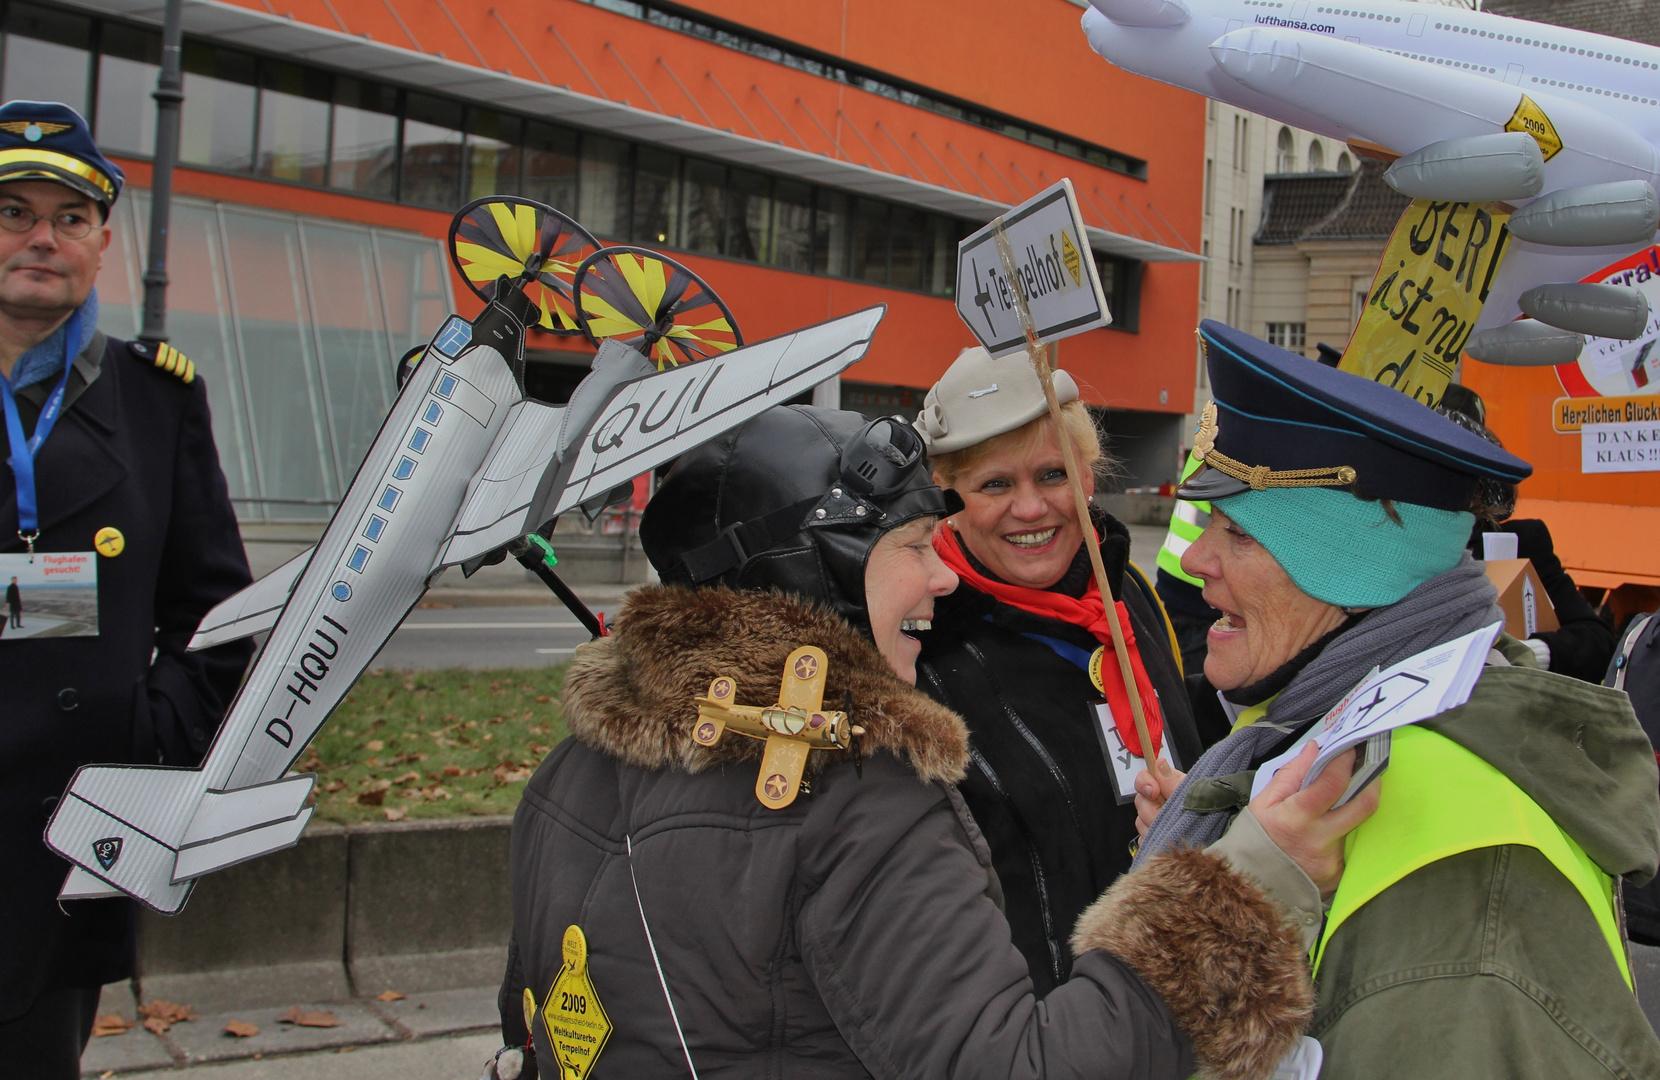 Carneval 2013 Berlin